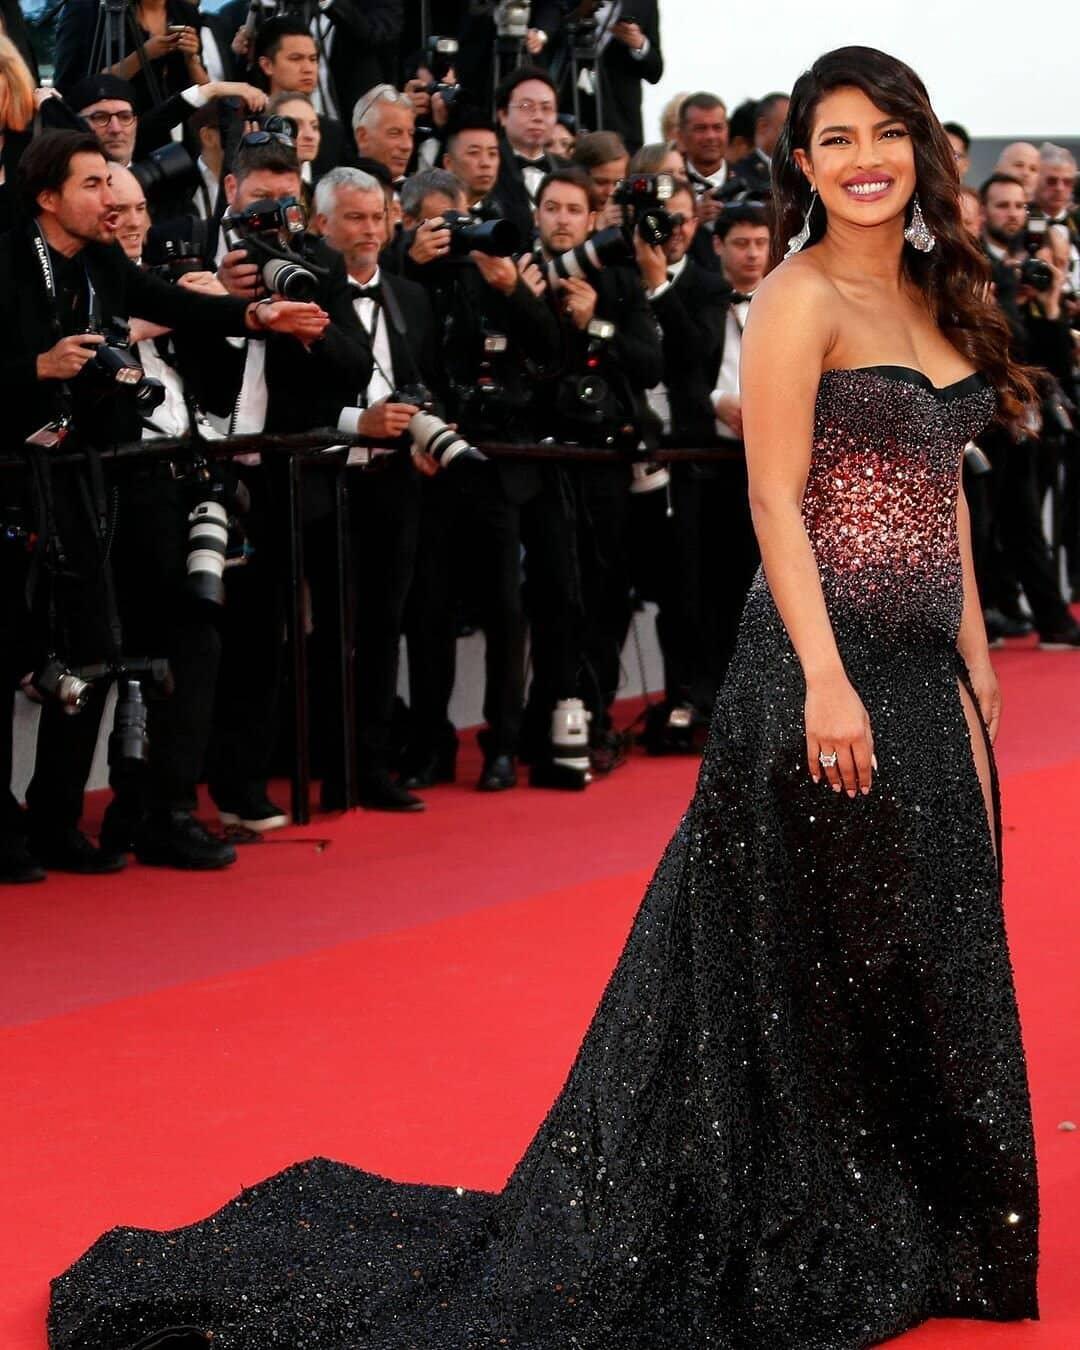 Cannes 2019: Priyanka Chopra Steals The Show In The Classic White Ensemble